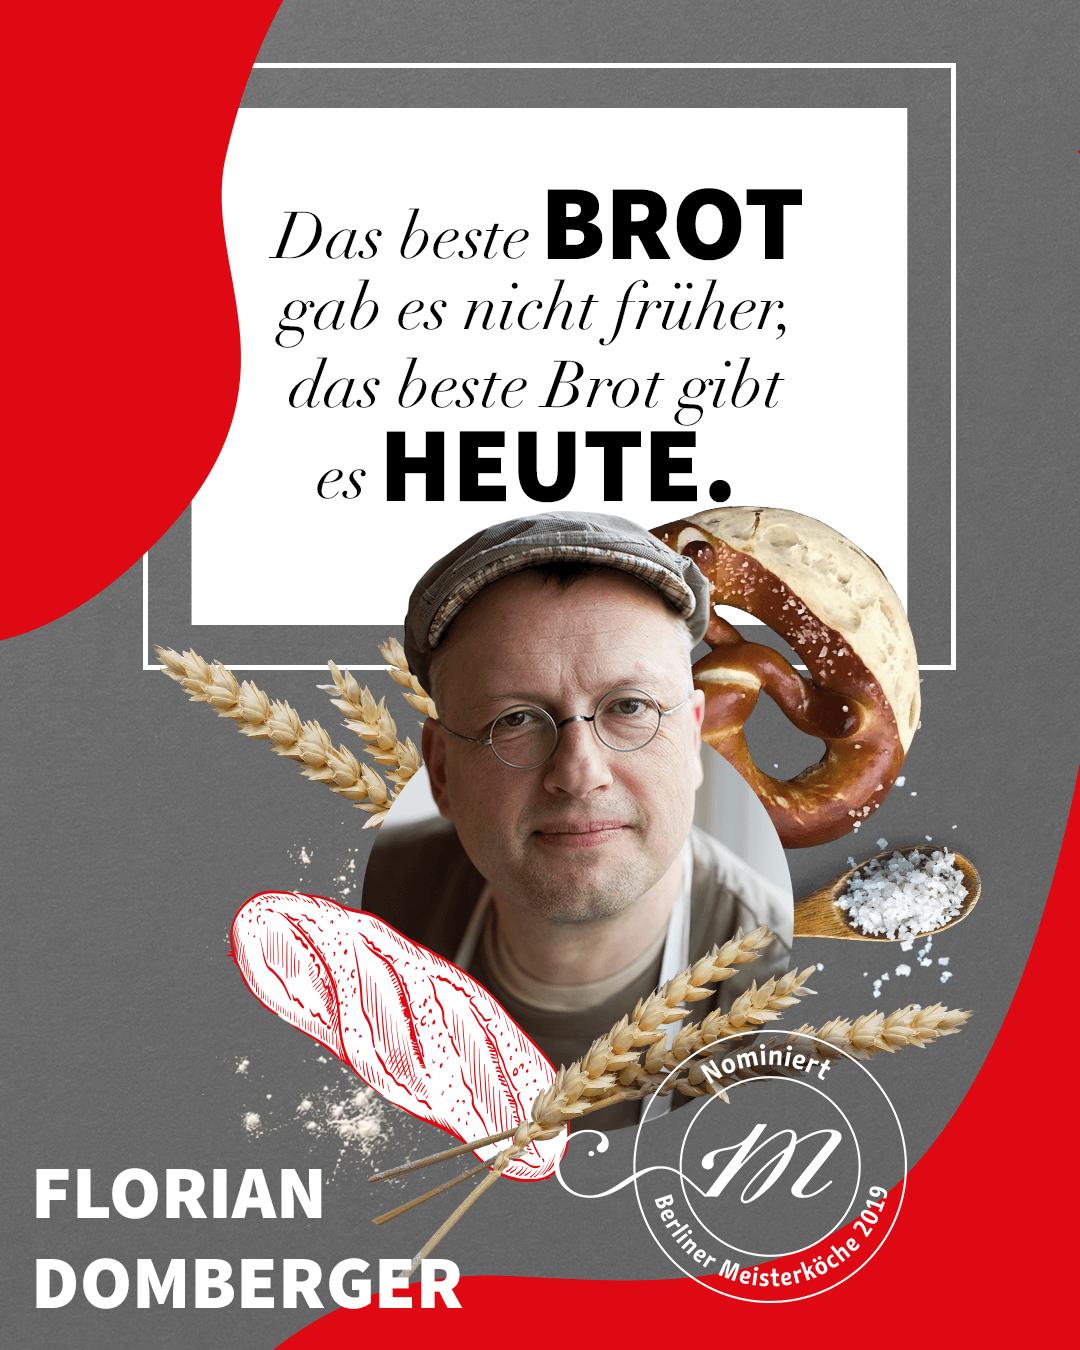 MK_VisualStatement_FlorianDomberger_fb